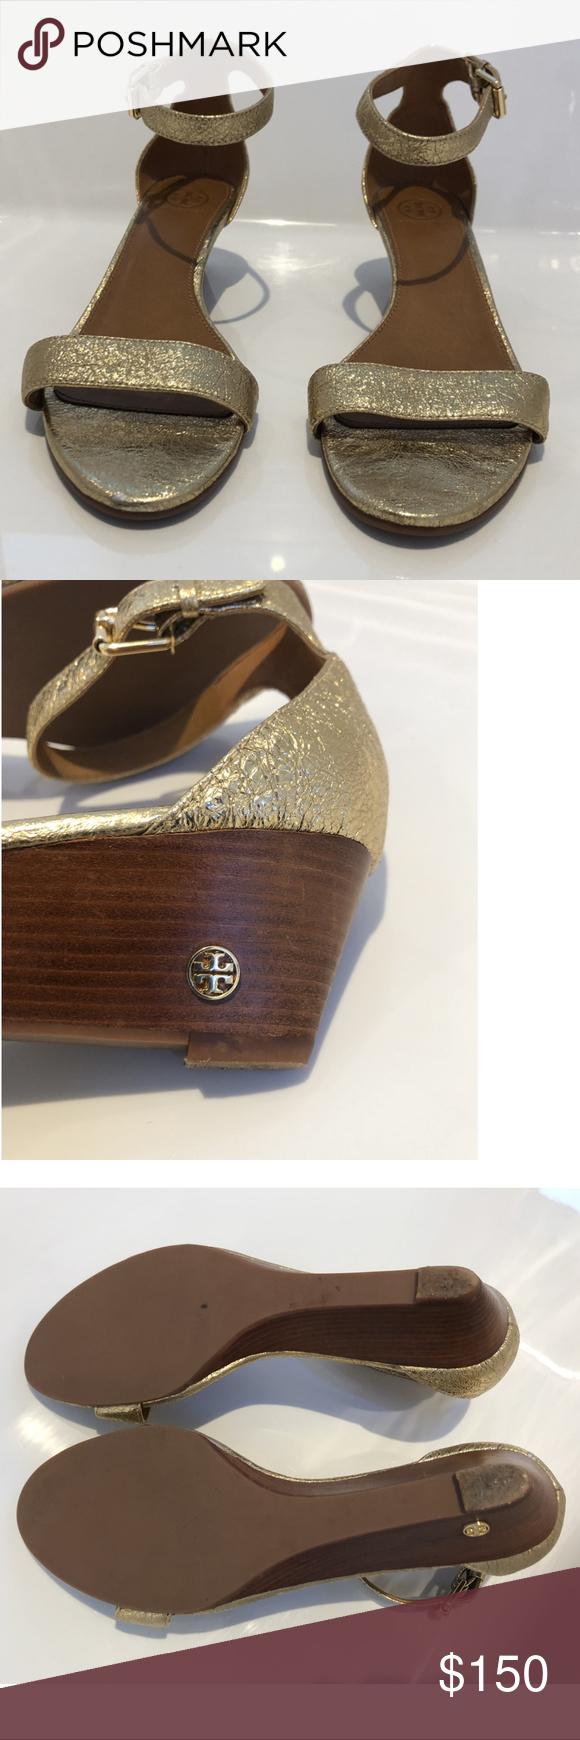 f933b9356 Tory Burch Saharian Gold Savannah Sandal Wedges Gleaming metallic leather